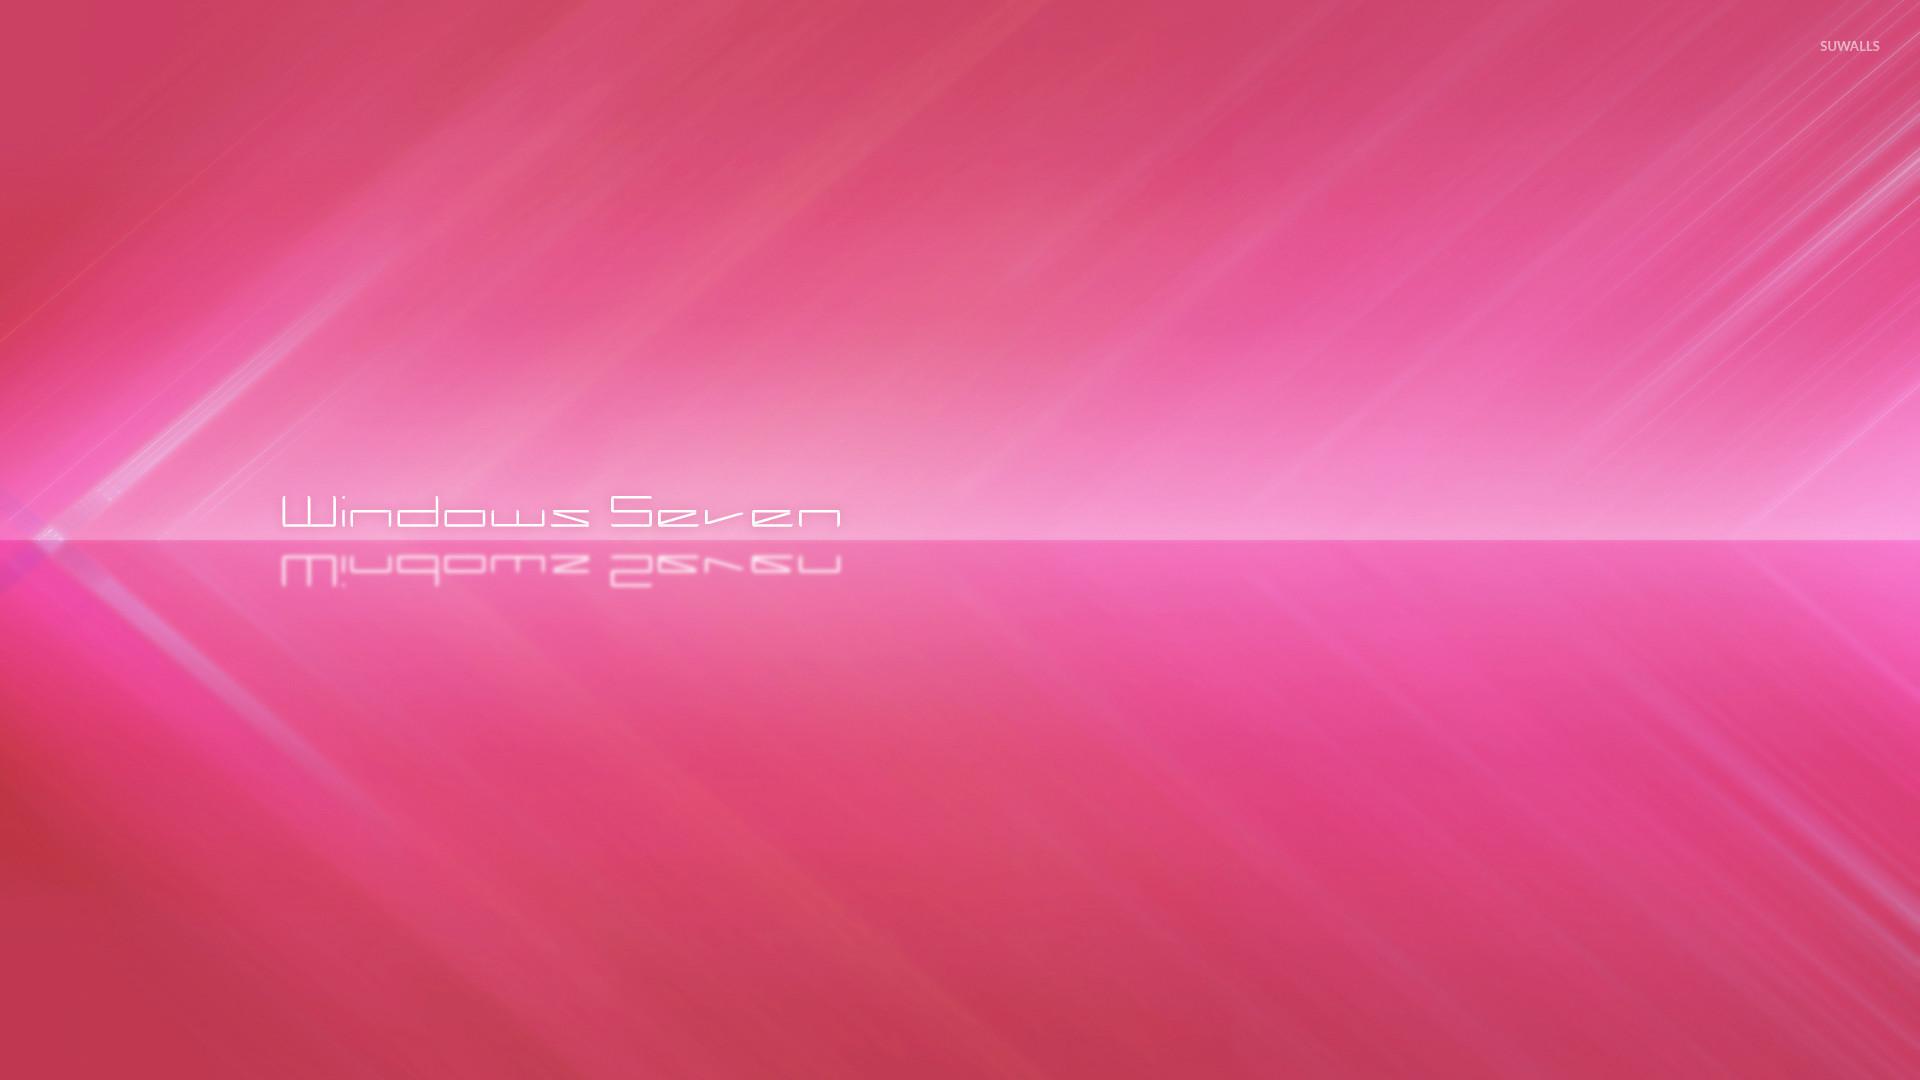 White Windows Seven between pink stripes wallpaper